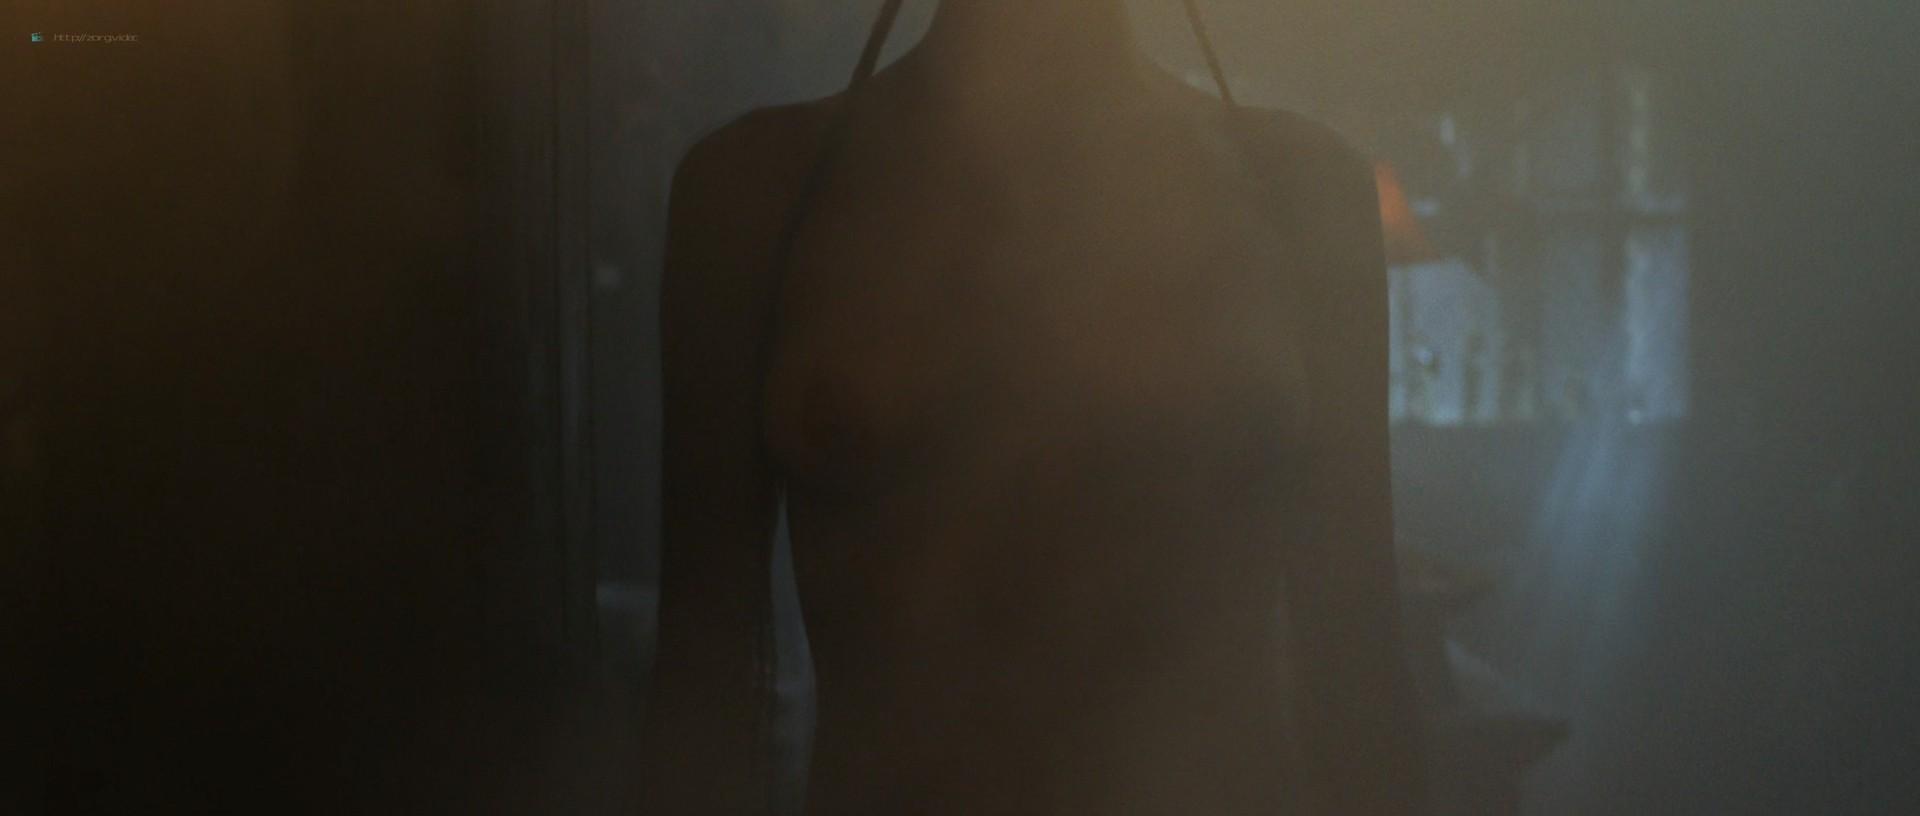 Cara Delevingne nude topless Tamzin Merchant nude sex Karla Crome sexy - Carnival Row (2019) s1e4-8 HD 1080p (14)